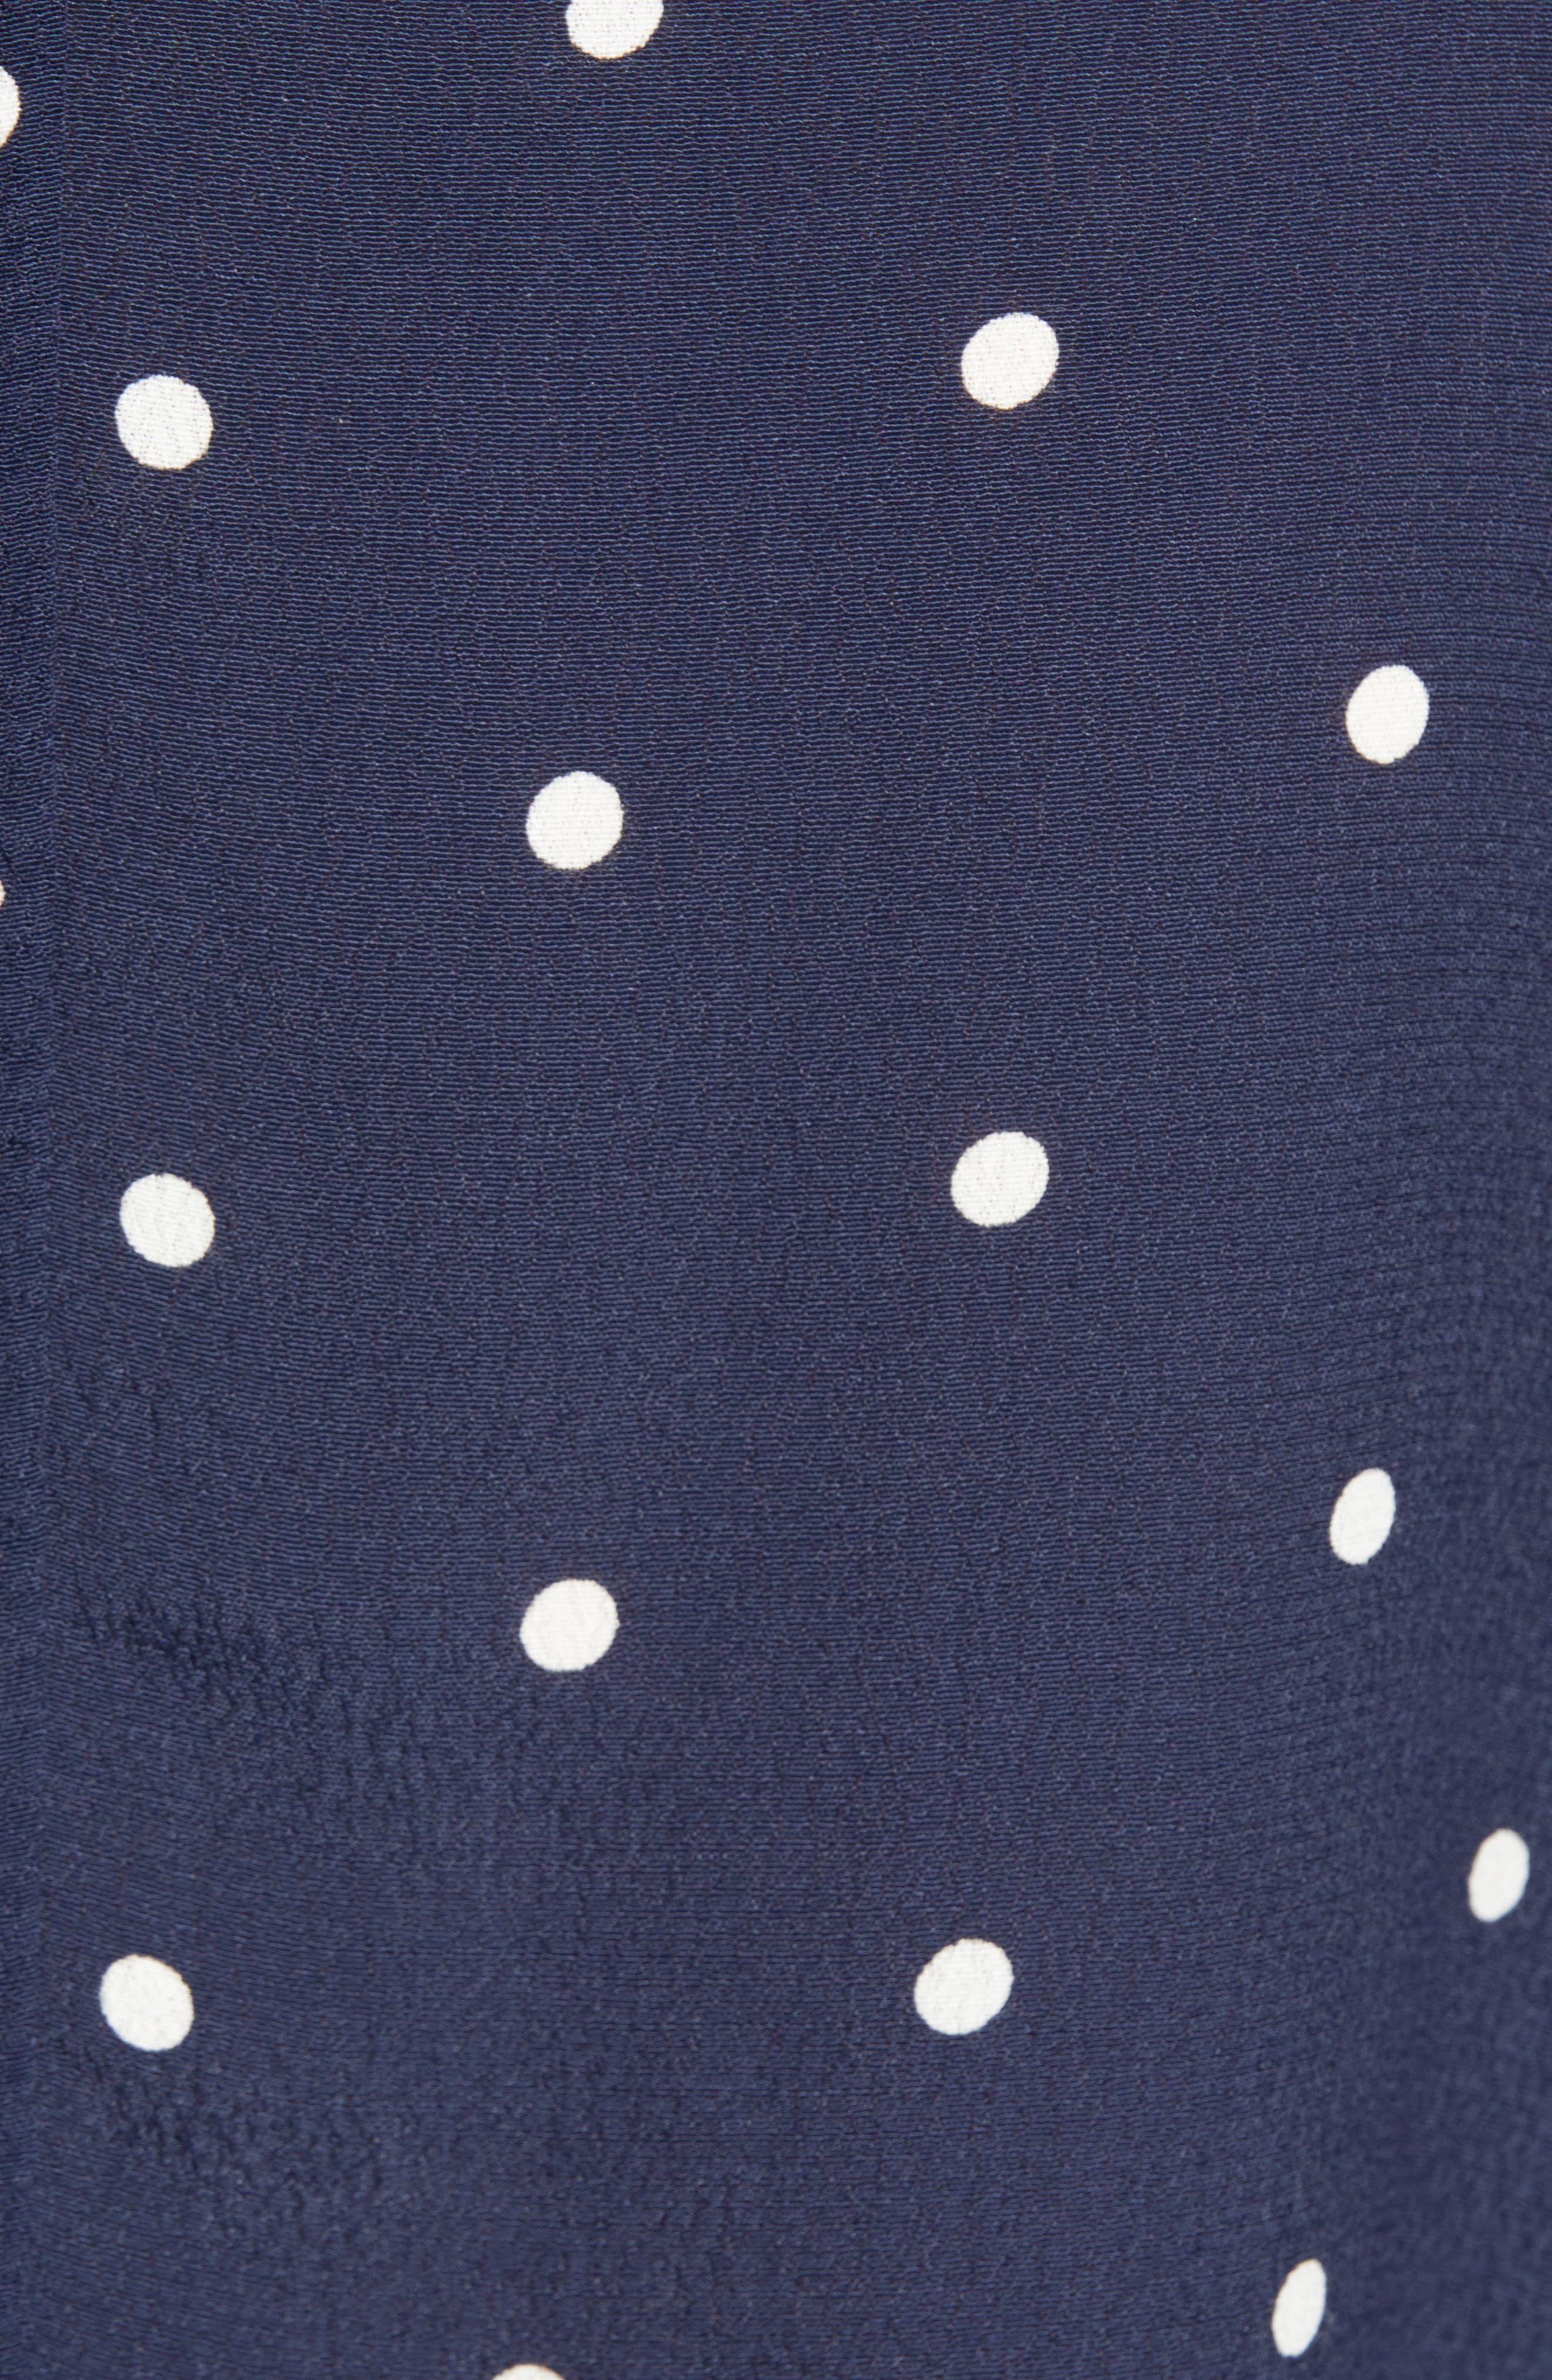 Sloane Tie Front Top,                             Alternate thumbnail 5, color,                             NAVY POLKA DOTS